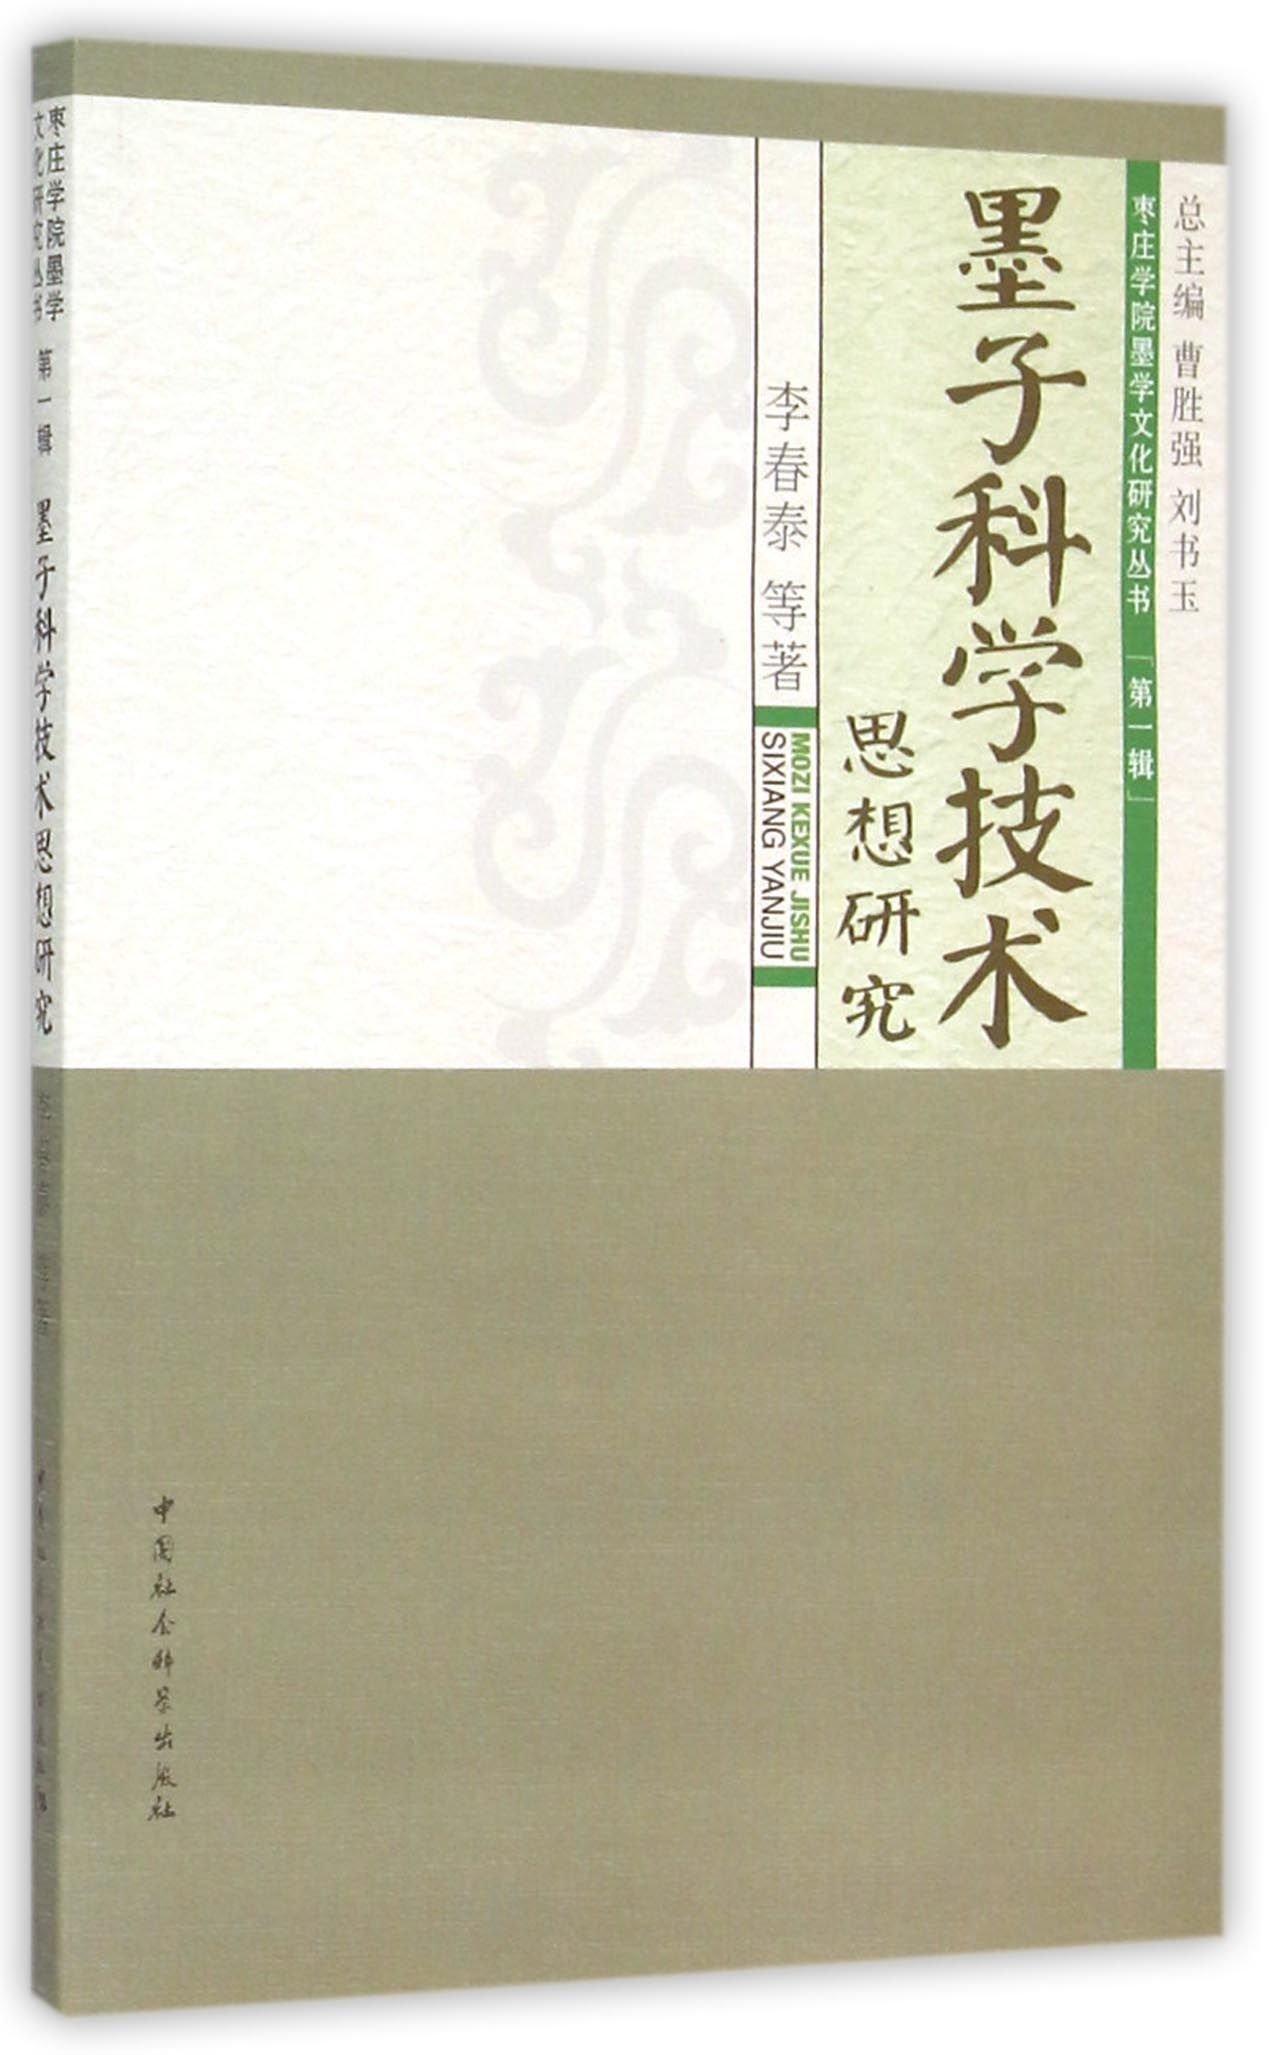 Read Online 墨子科学技术思想研究/枣庄学院墨学文化研究丛书 pdf